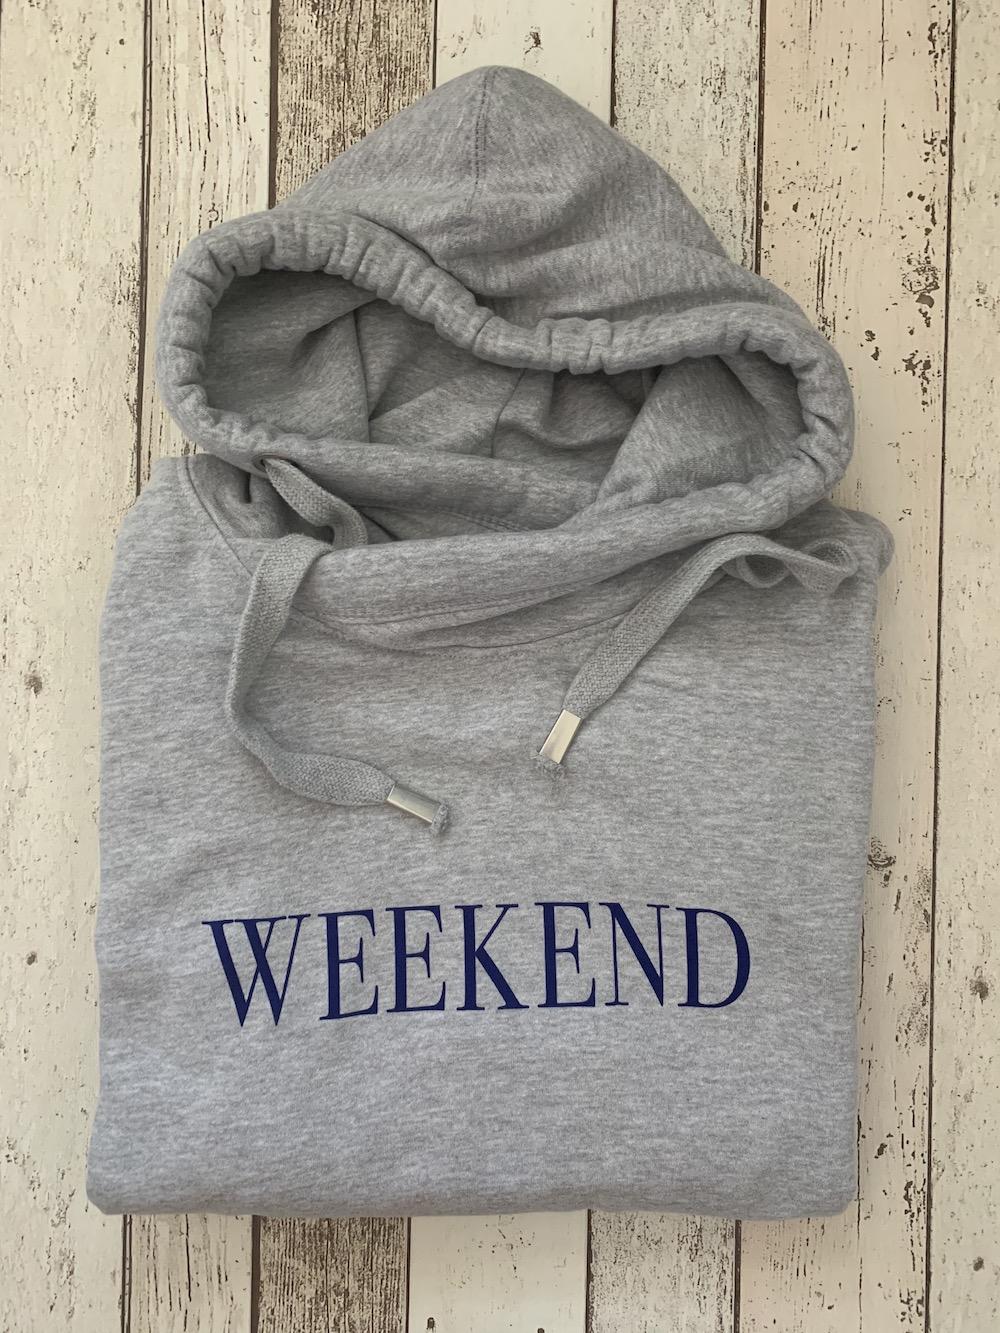 Weekend Cowl Neck Womens Hoodie – Grey And Navy